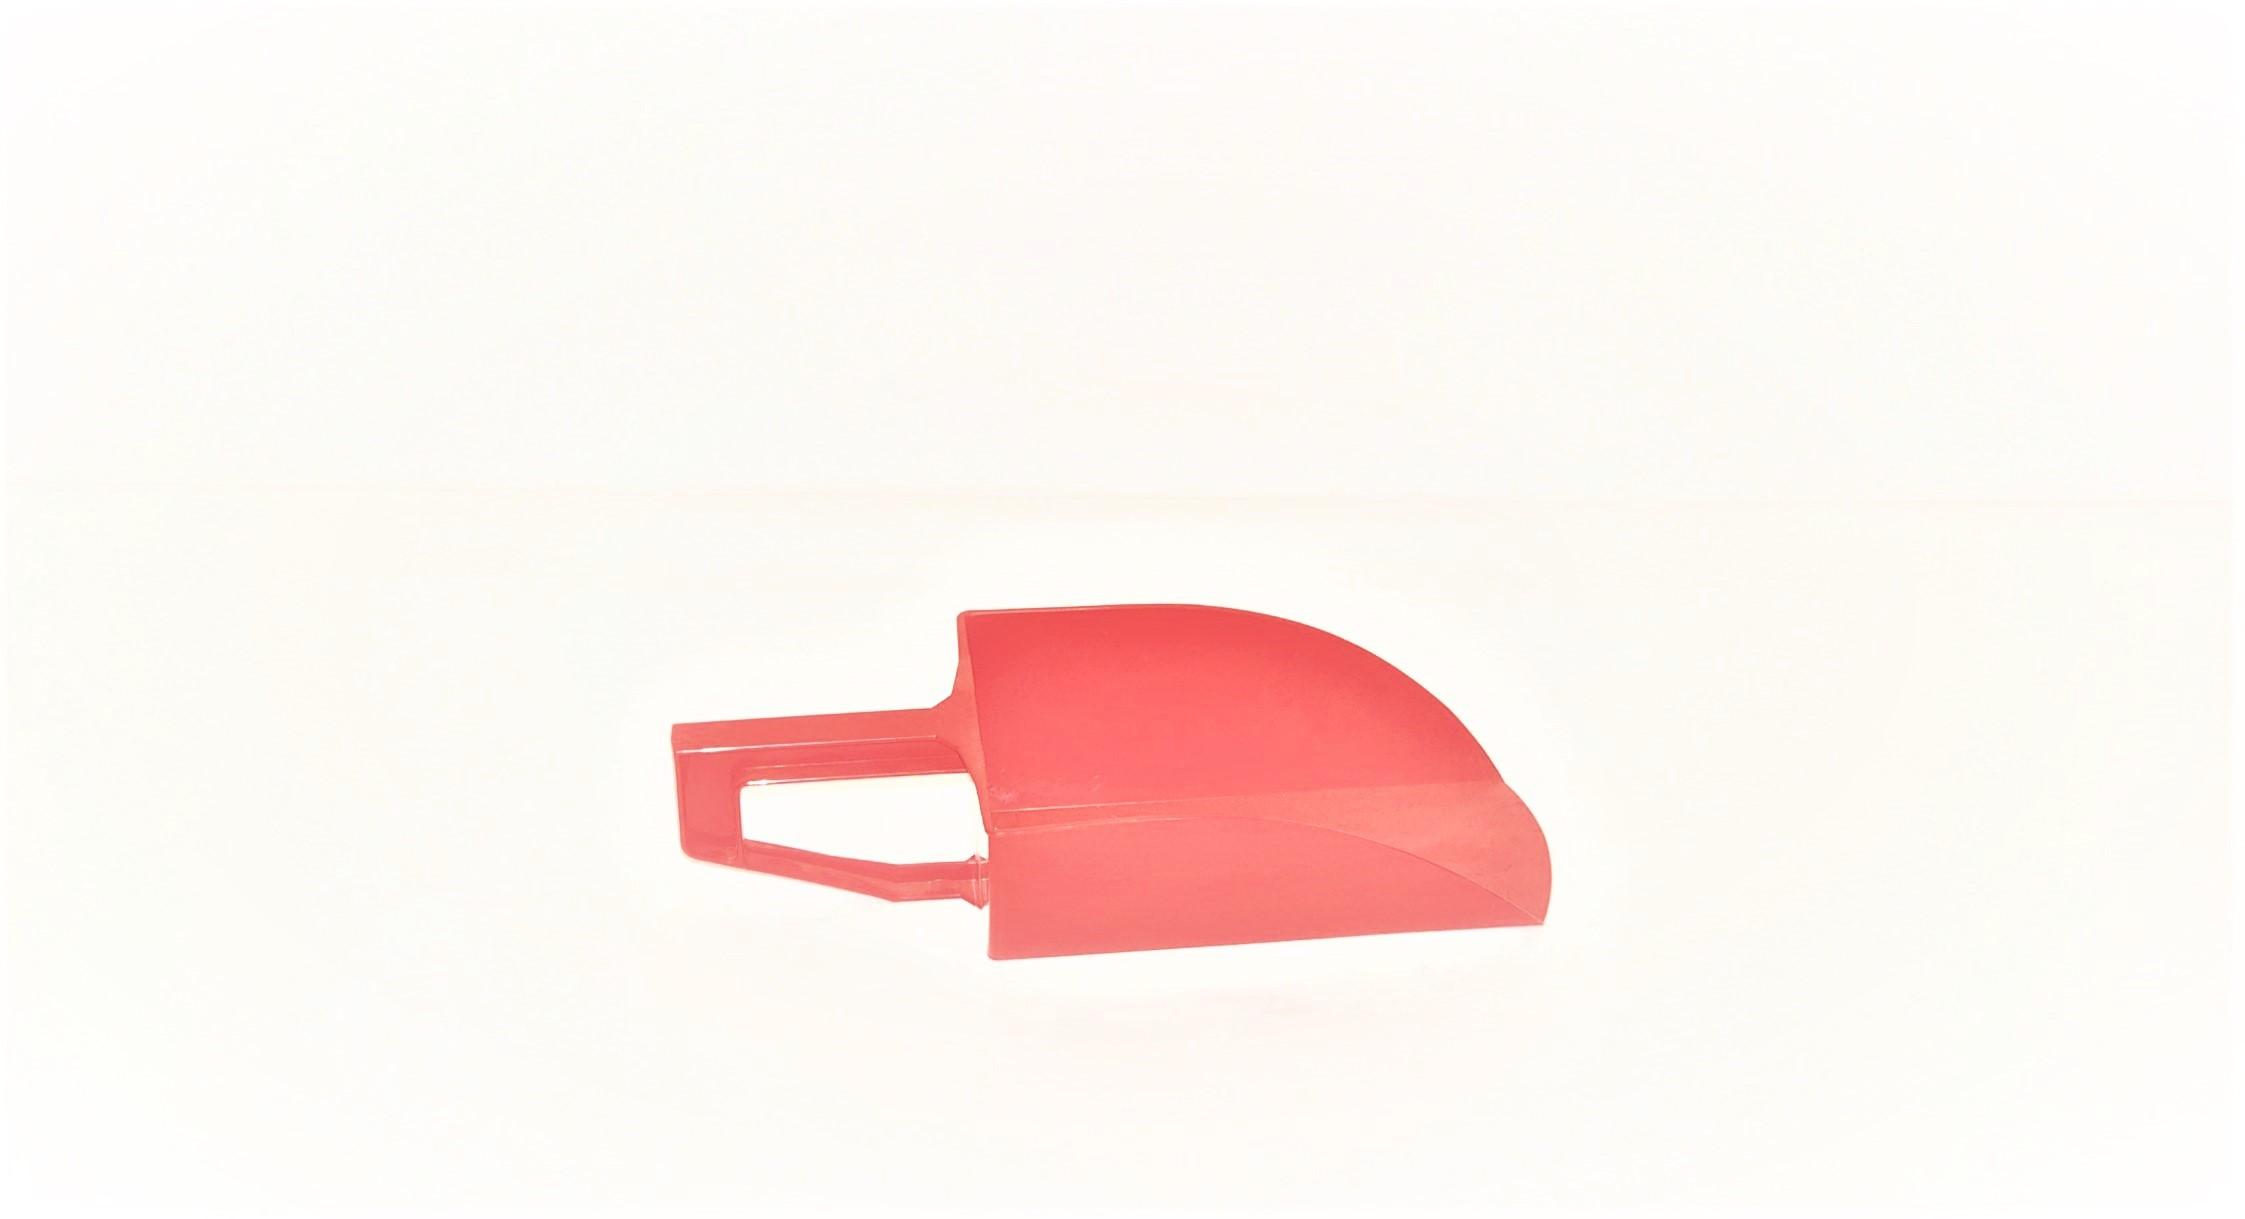 Pelle plastique